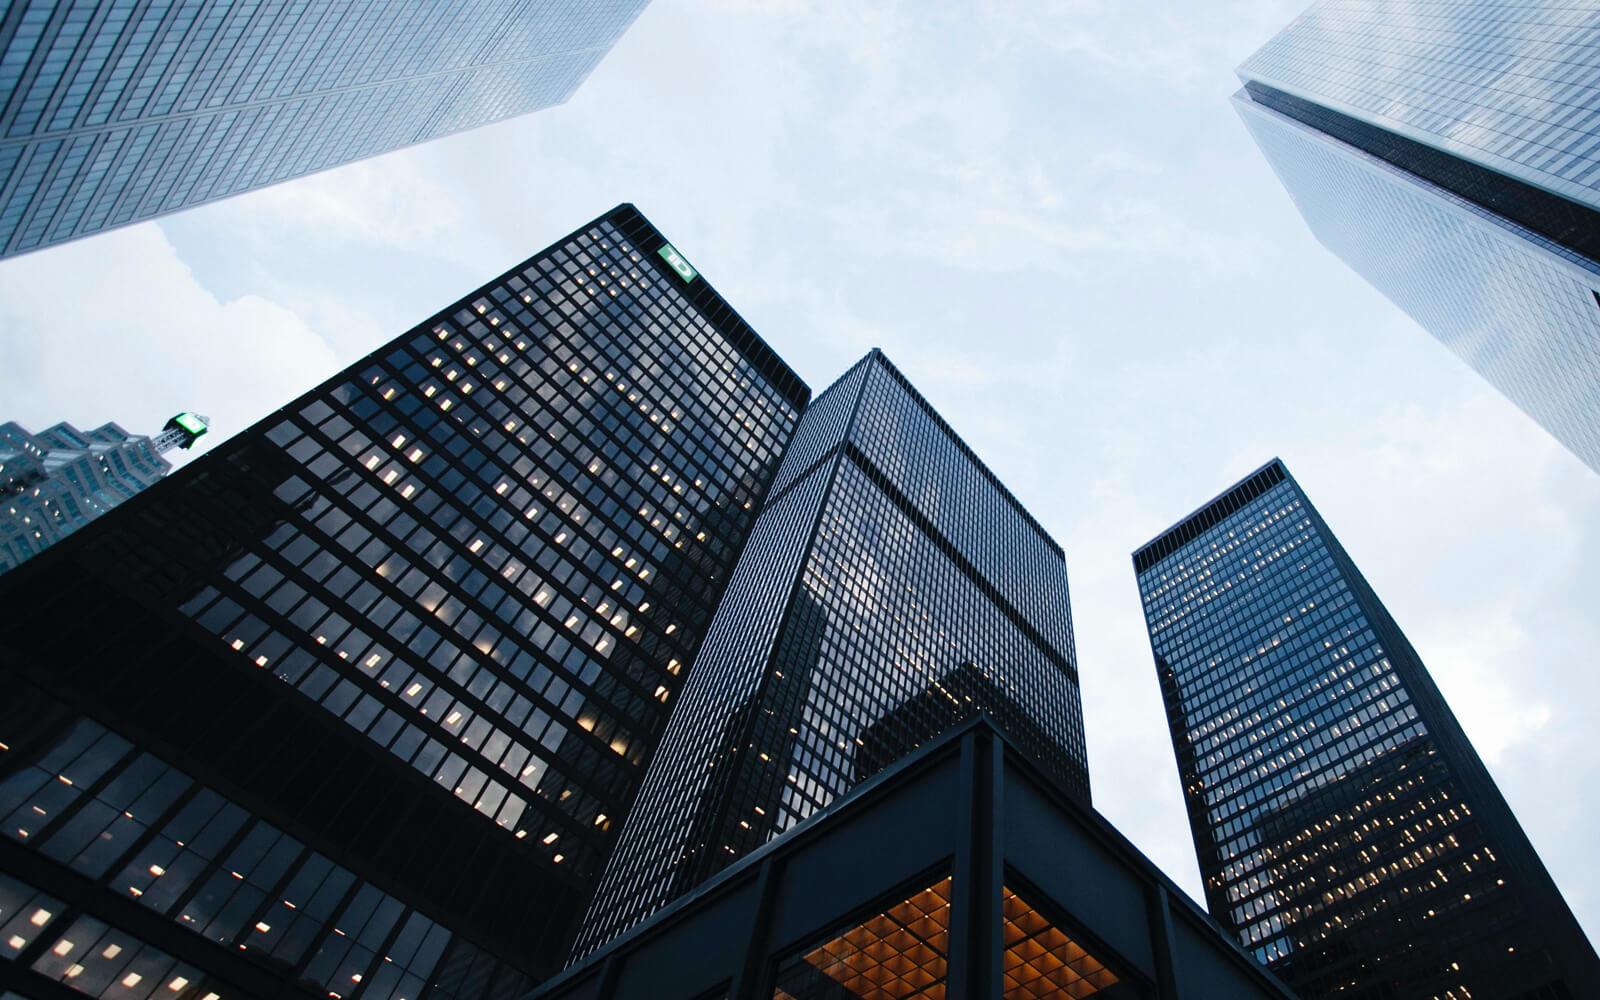 City skyline of high-rise buildings